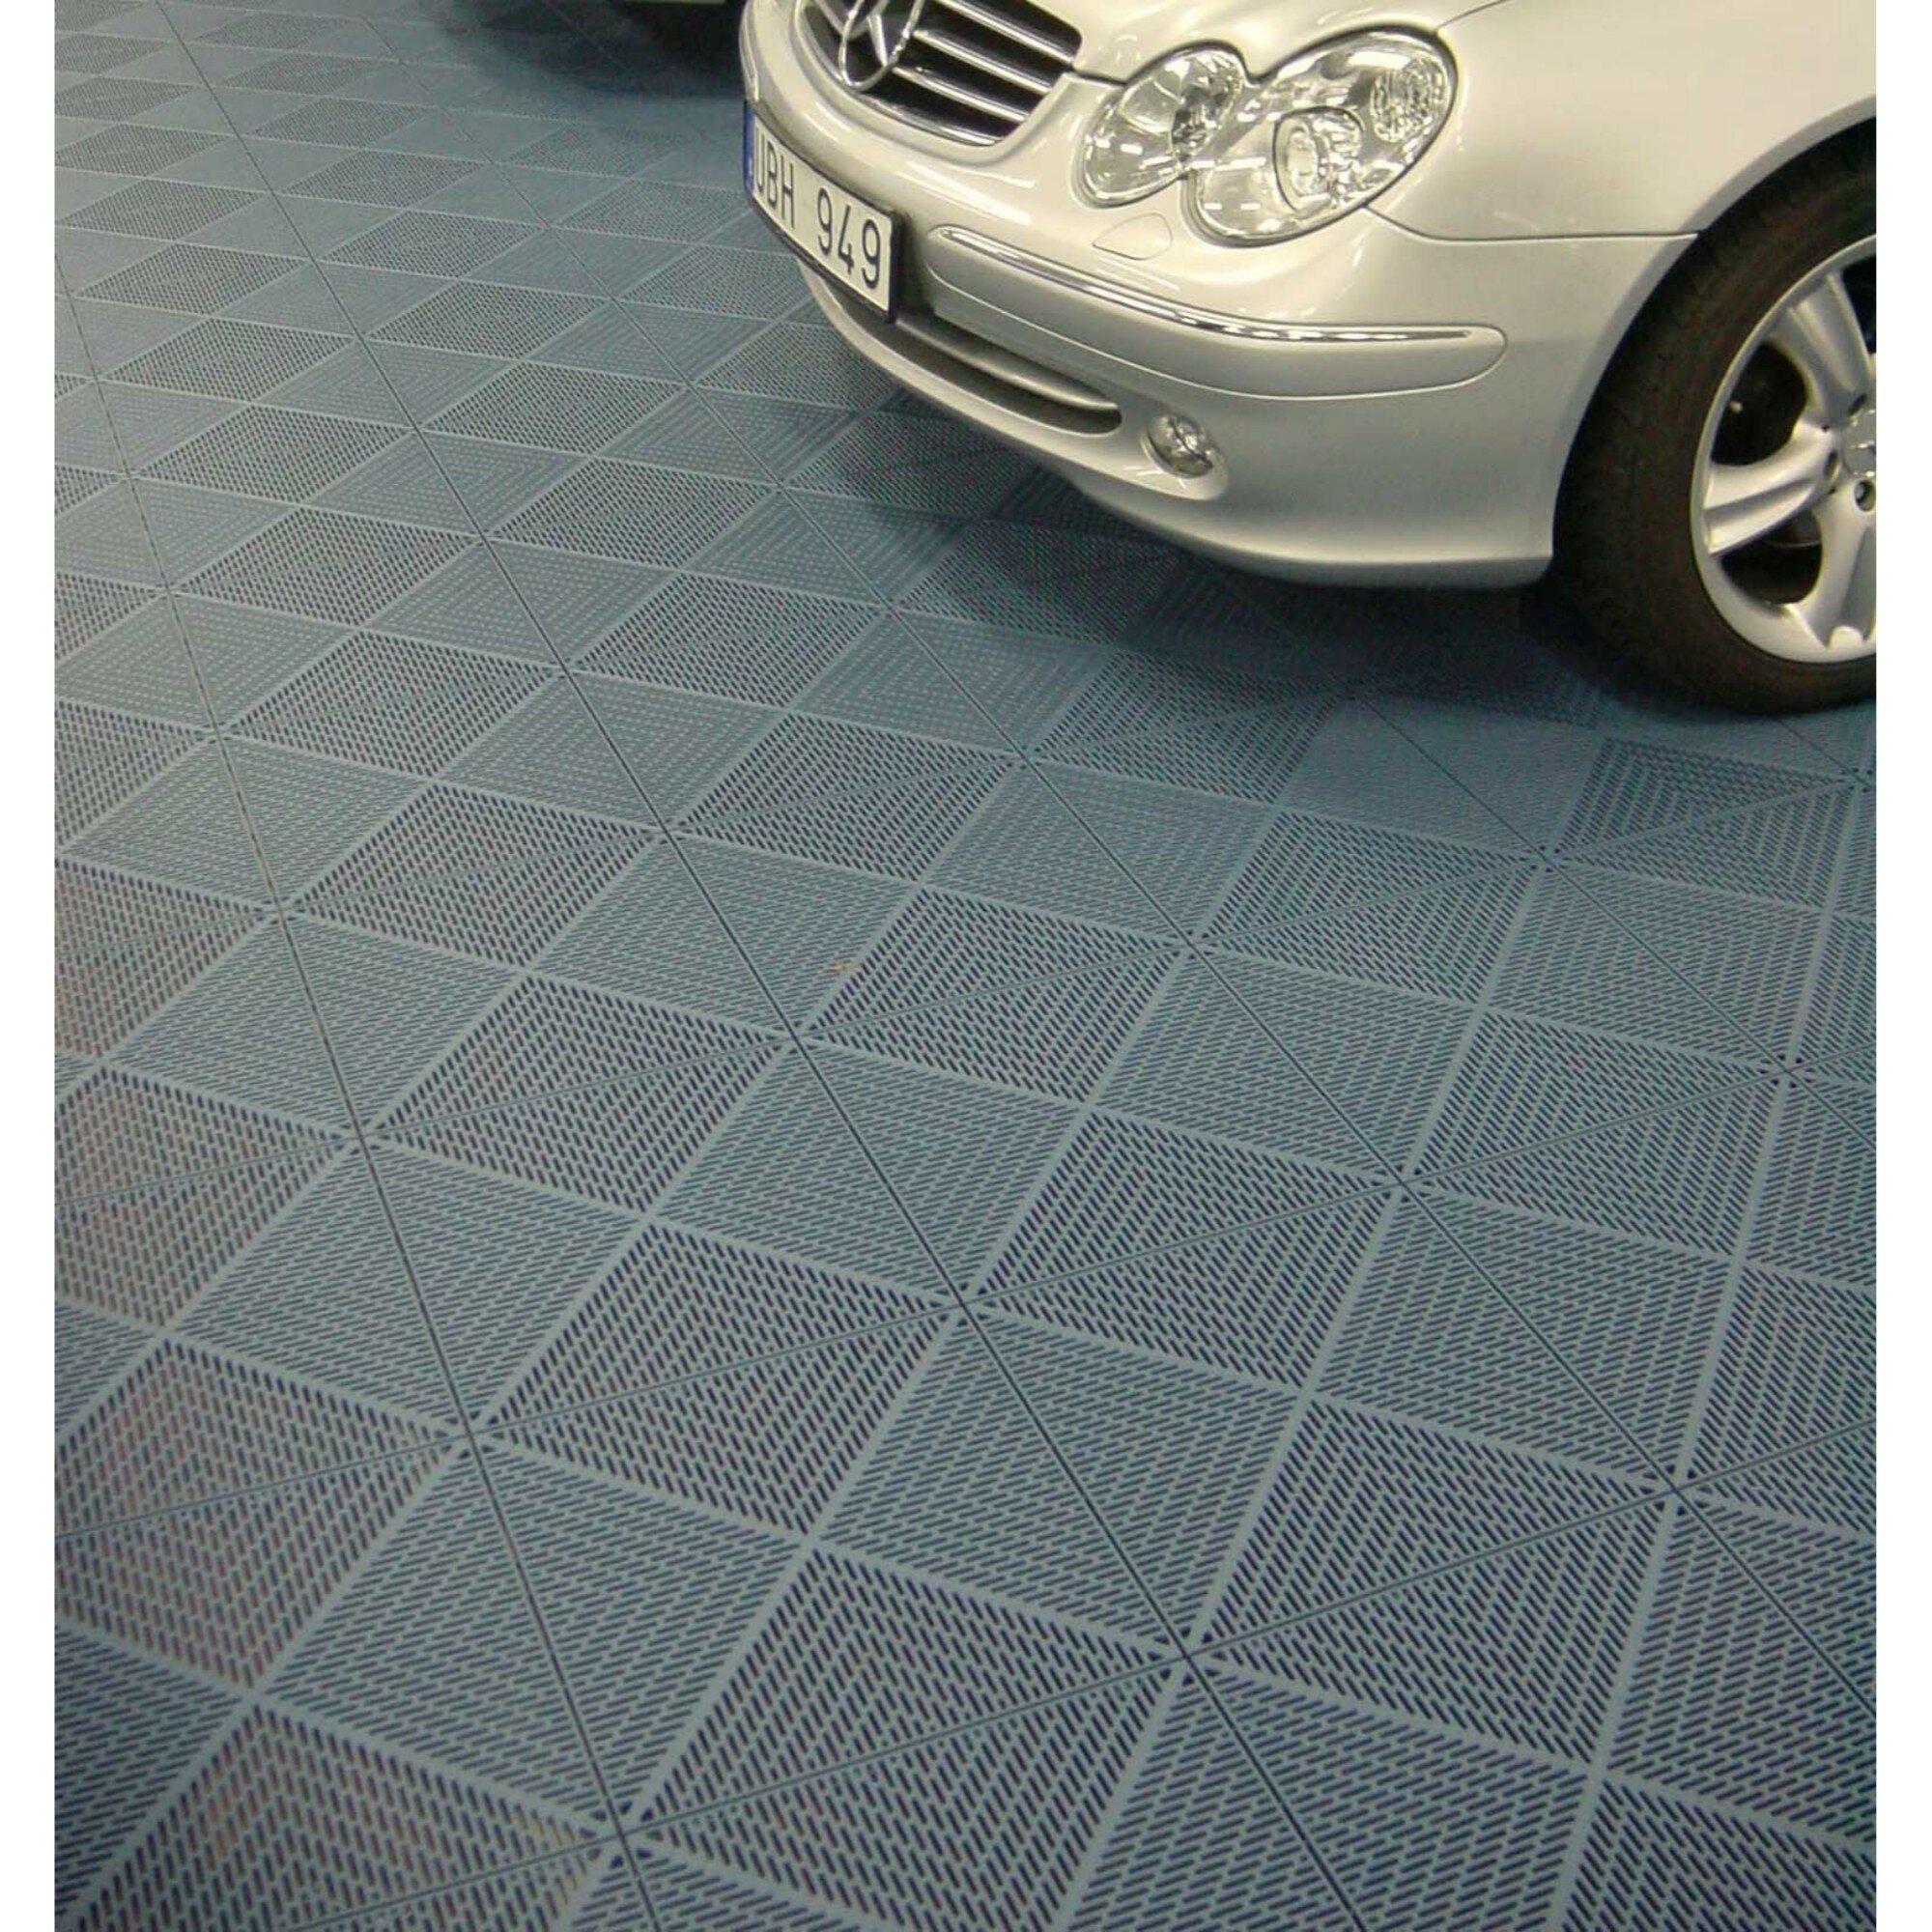 Mats Inc Bergo Unique 14 9 X 14 9 Garage Flooring Drain Tiles In Graphite Wayfair